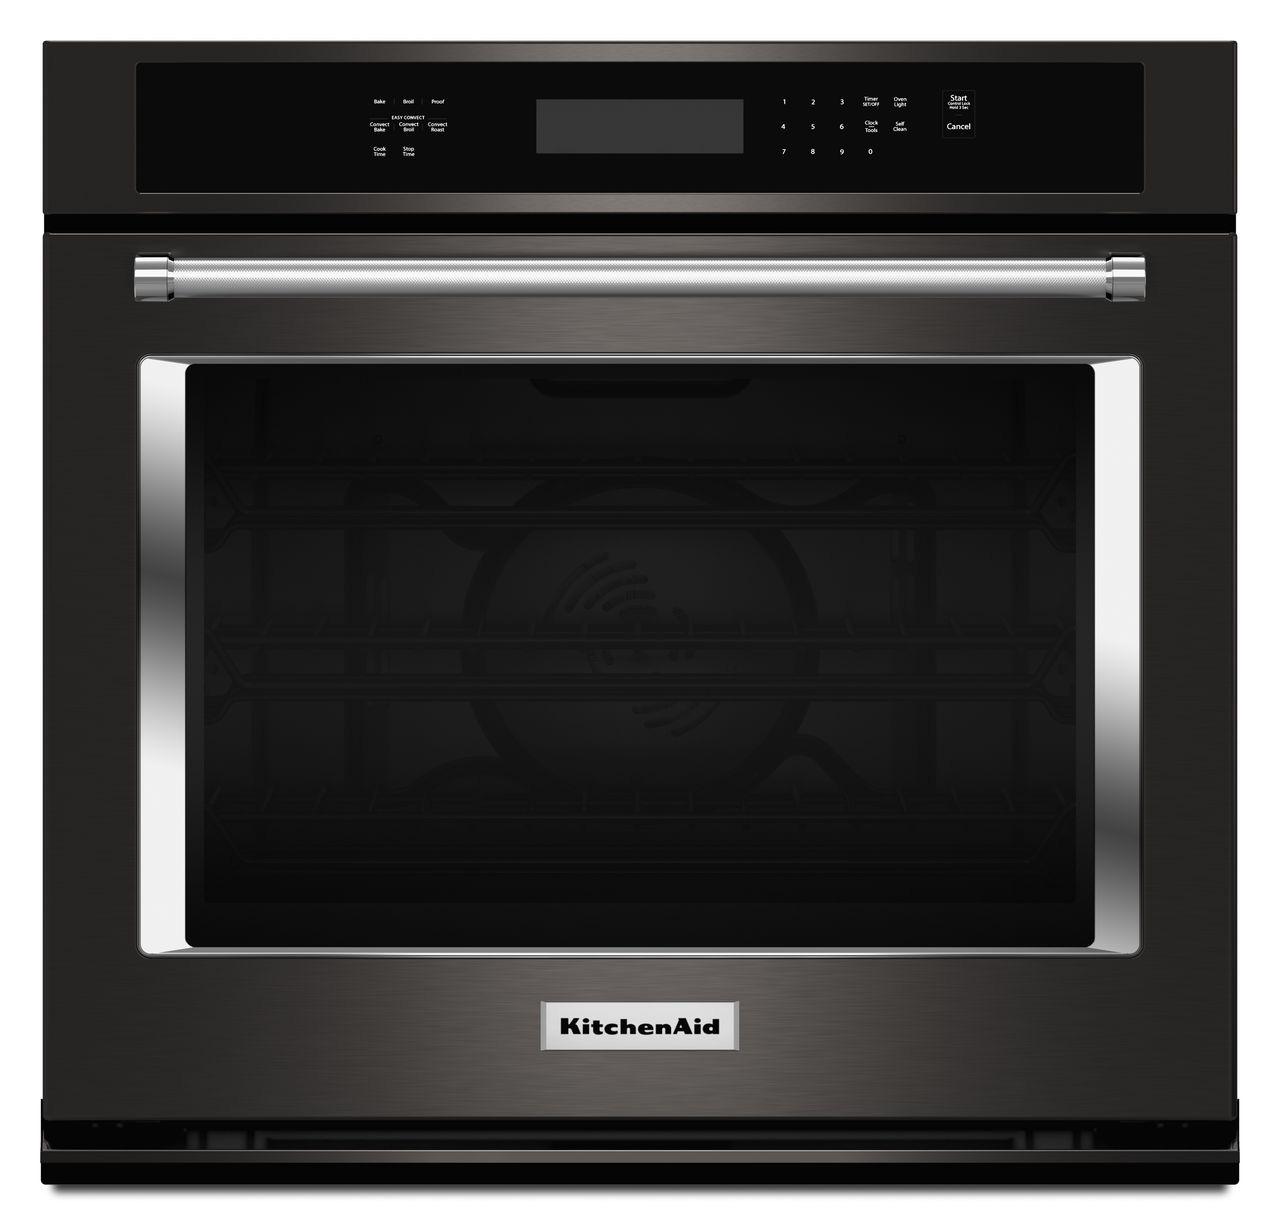 Kitchenaid S Black Stainless Steel Wowza: KitchenAid Black Stainless Single Wall Oven